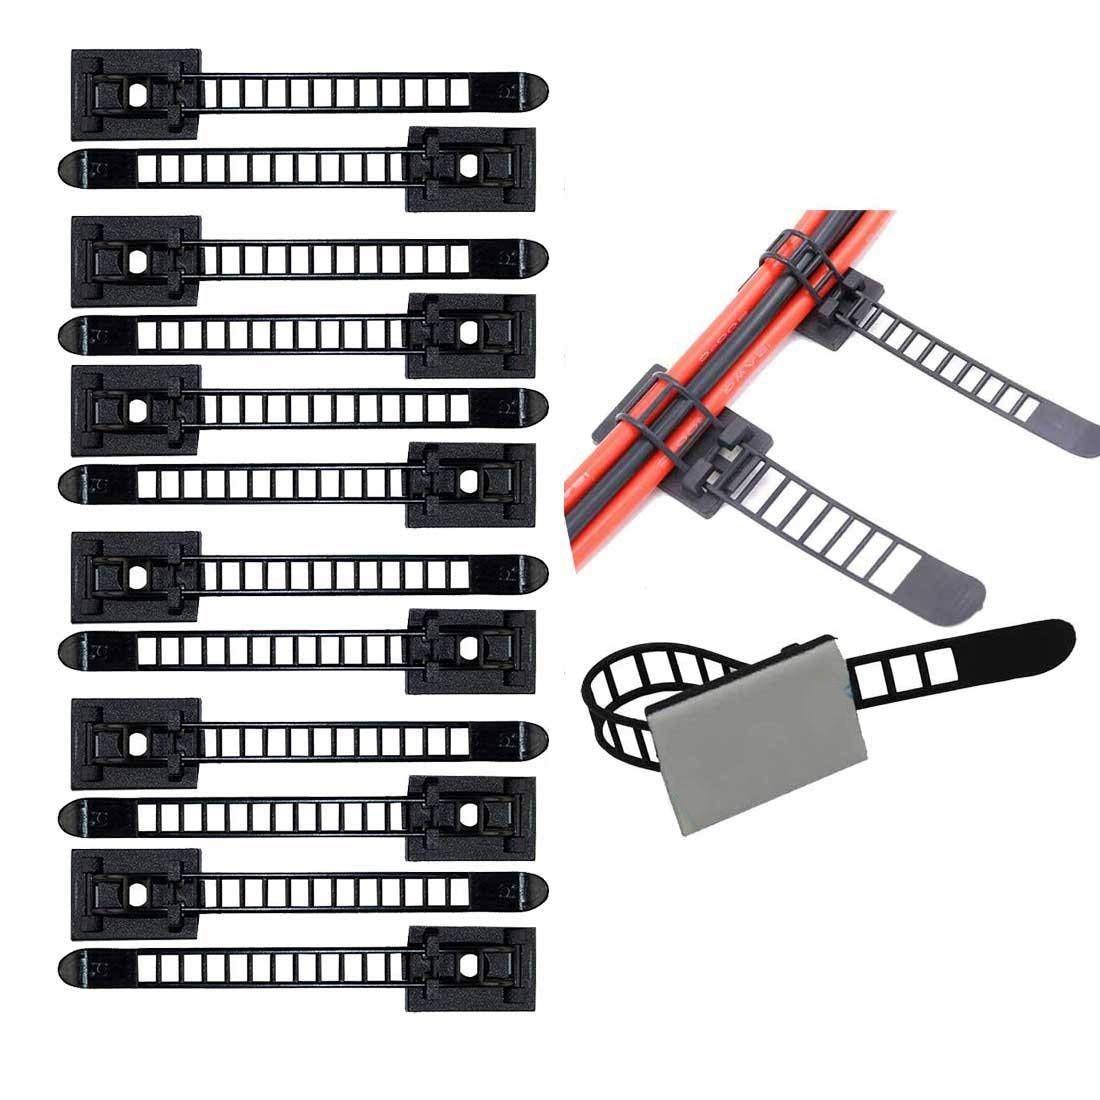 100 Uds ajustable Clips de Cable de auto-adhesivo de fijador de abrazadera de Cable Correa titular Jun 20 Dropshipping. Exclusivo. Cable Clips organizadores de Cable